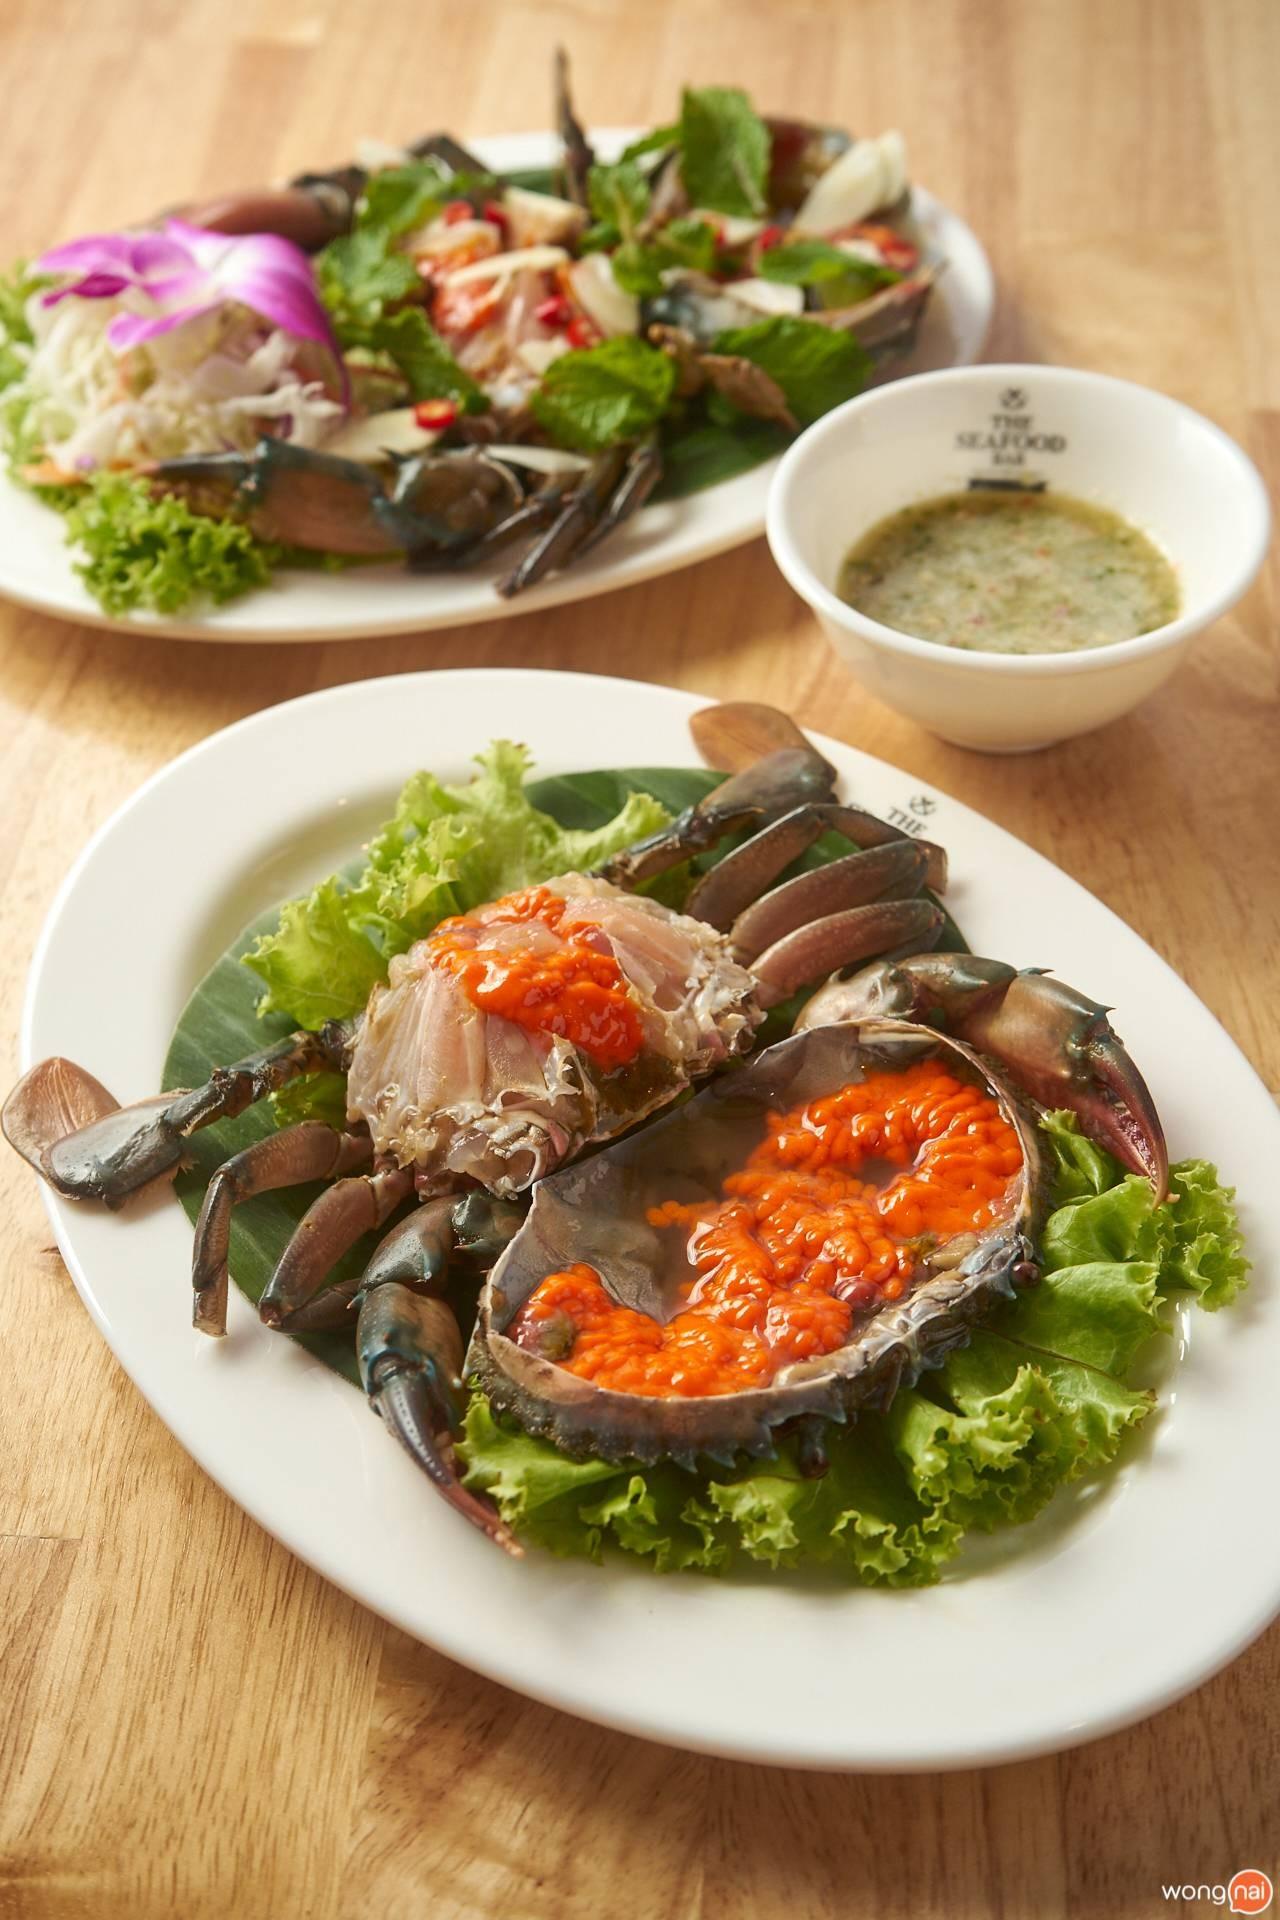 The Seafood Bar by ส้มตำคุณแดง ปูไข่ดอง